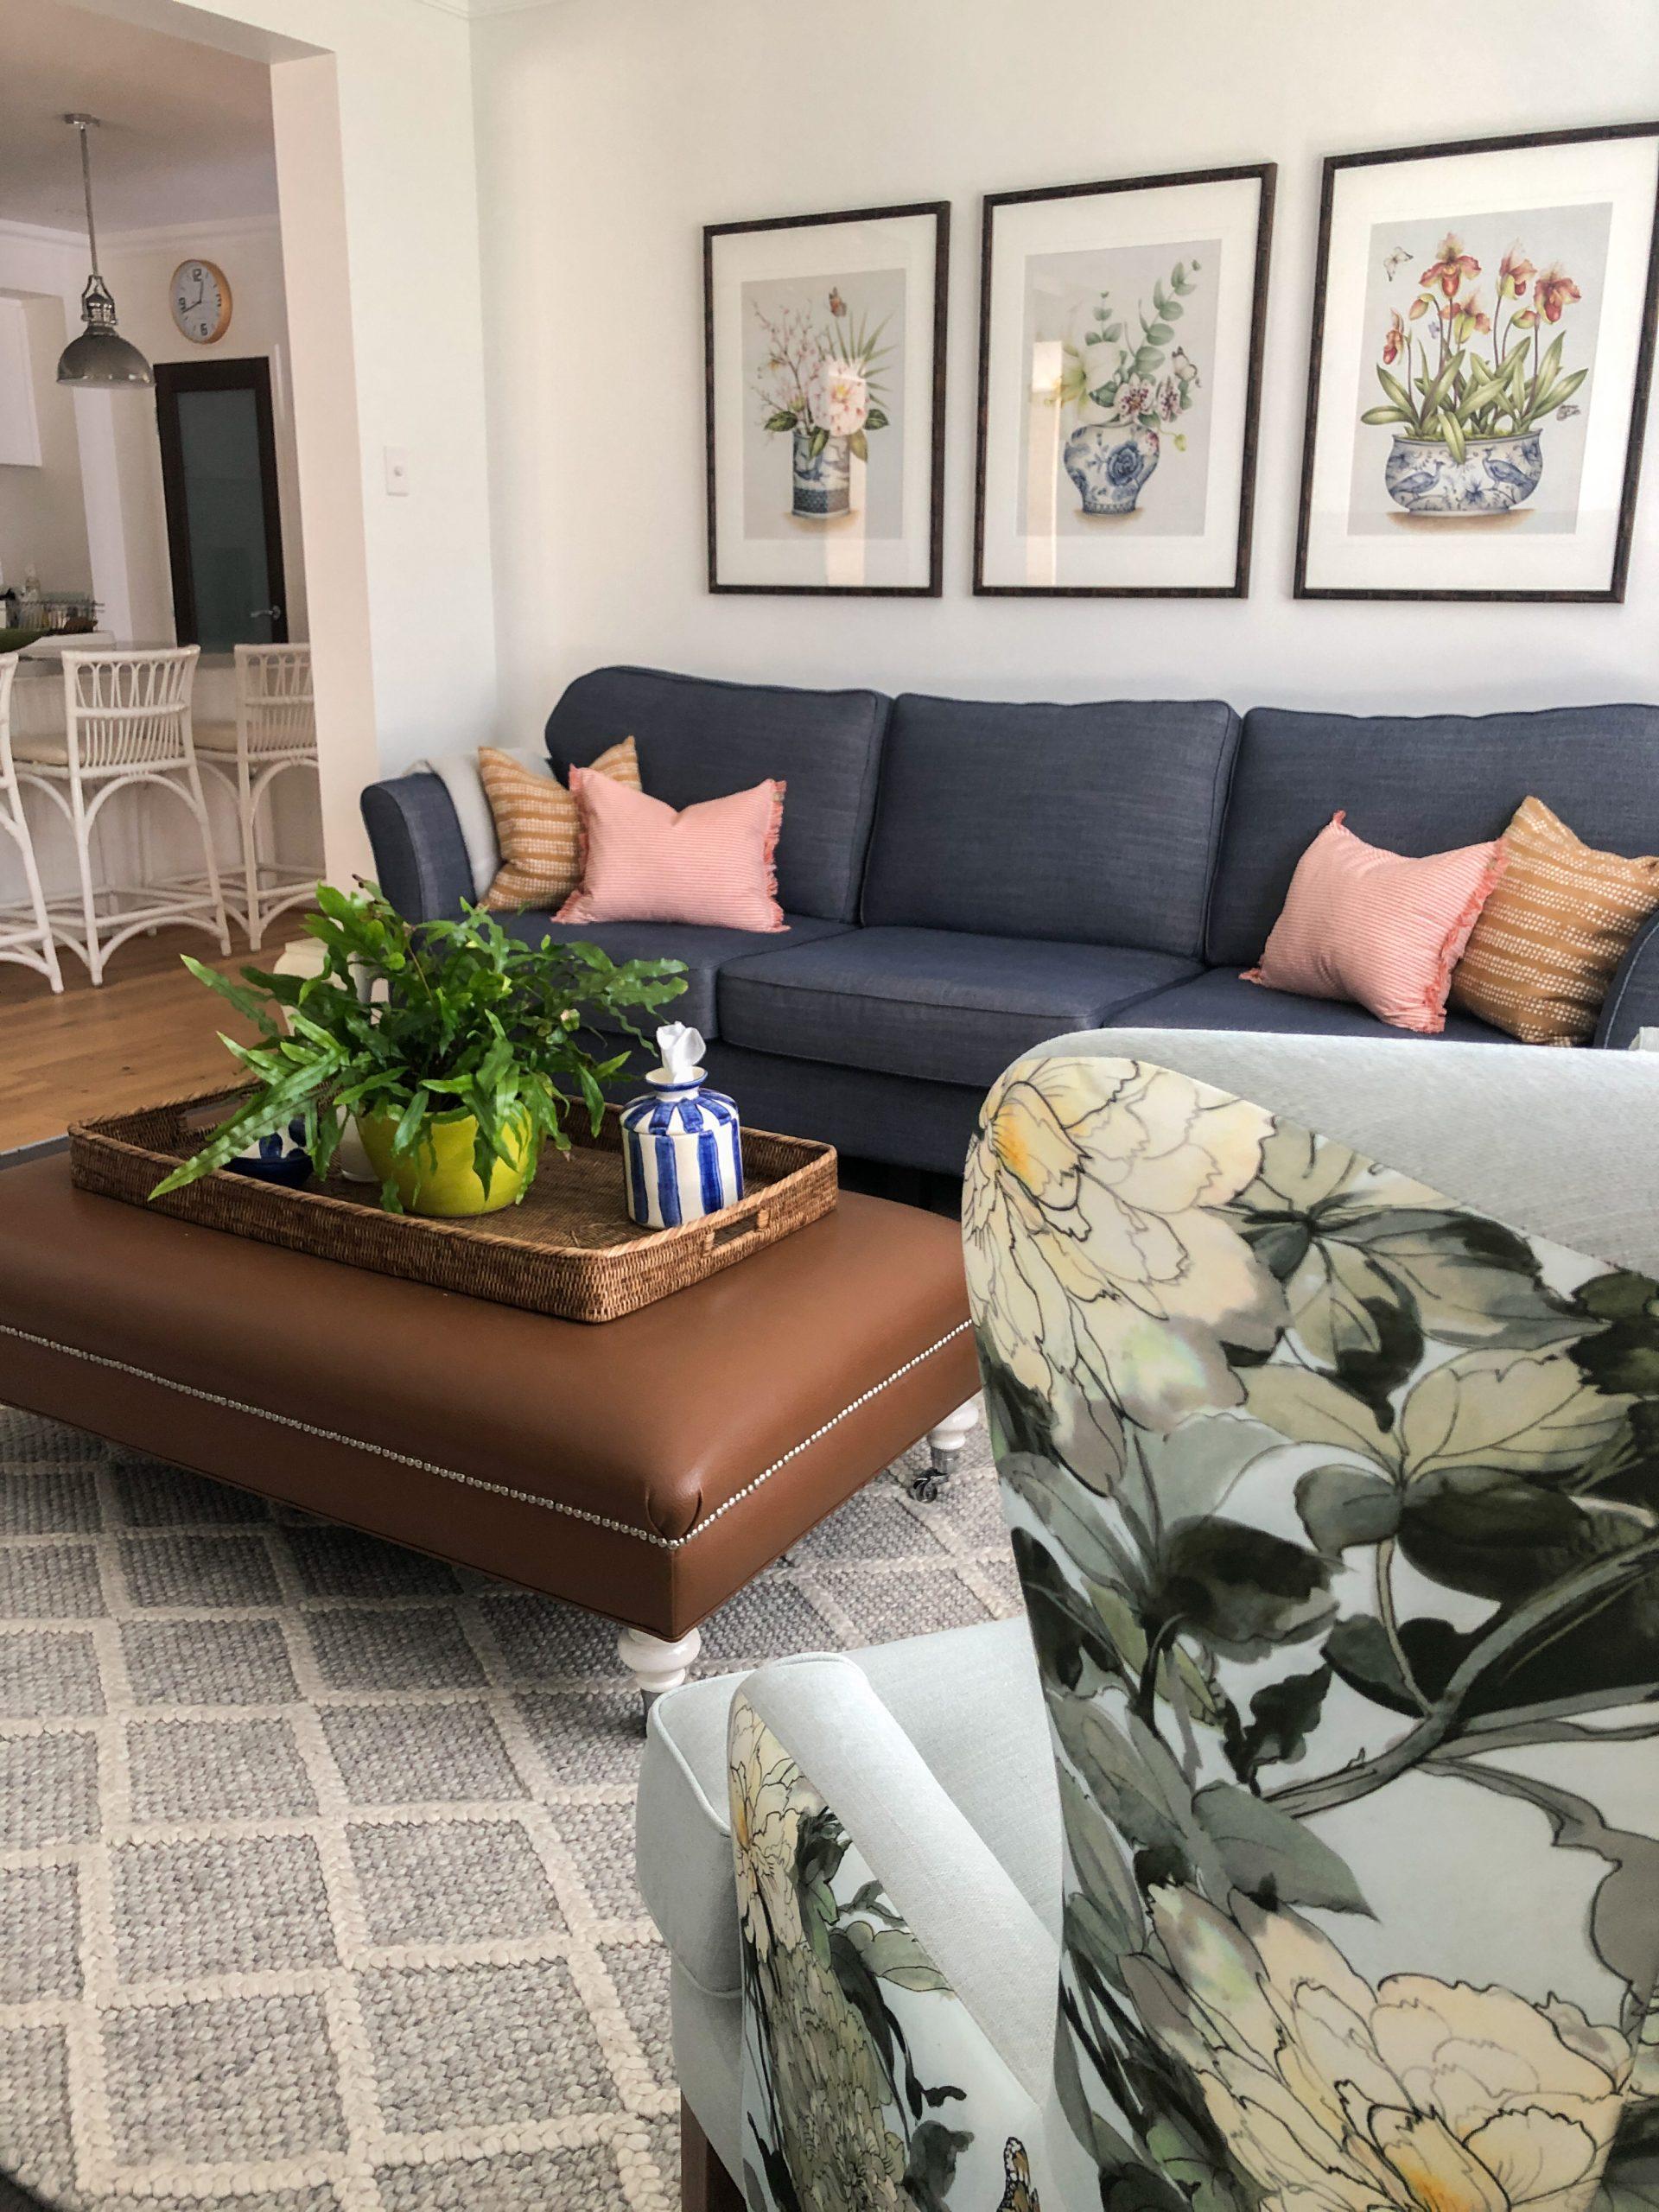 https://www.ivyandfinch.com.au/wp-content/uploads/2021/02/The-Gap-Interior-Design-Custom-Furniture-scaled.jpg